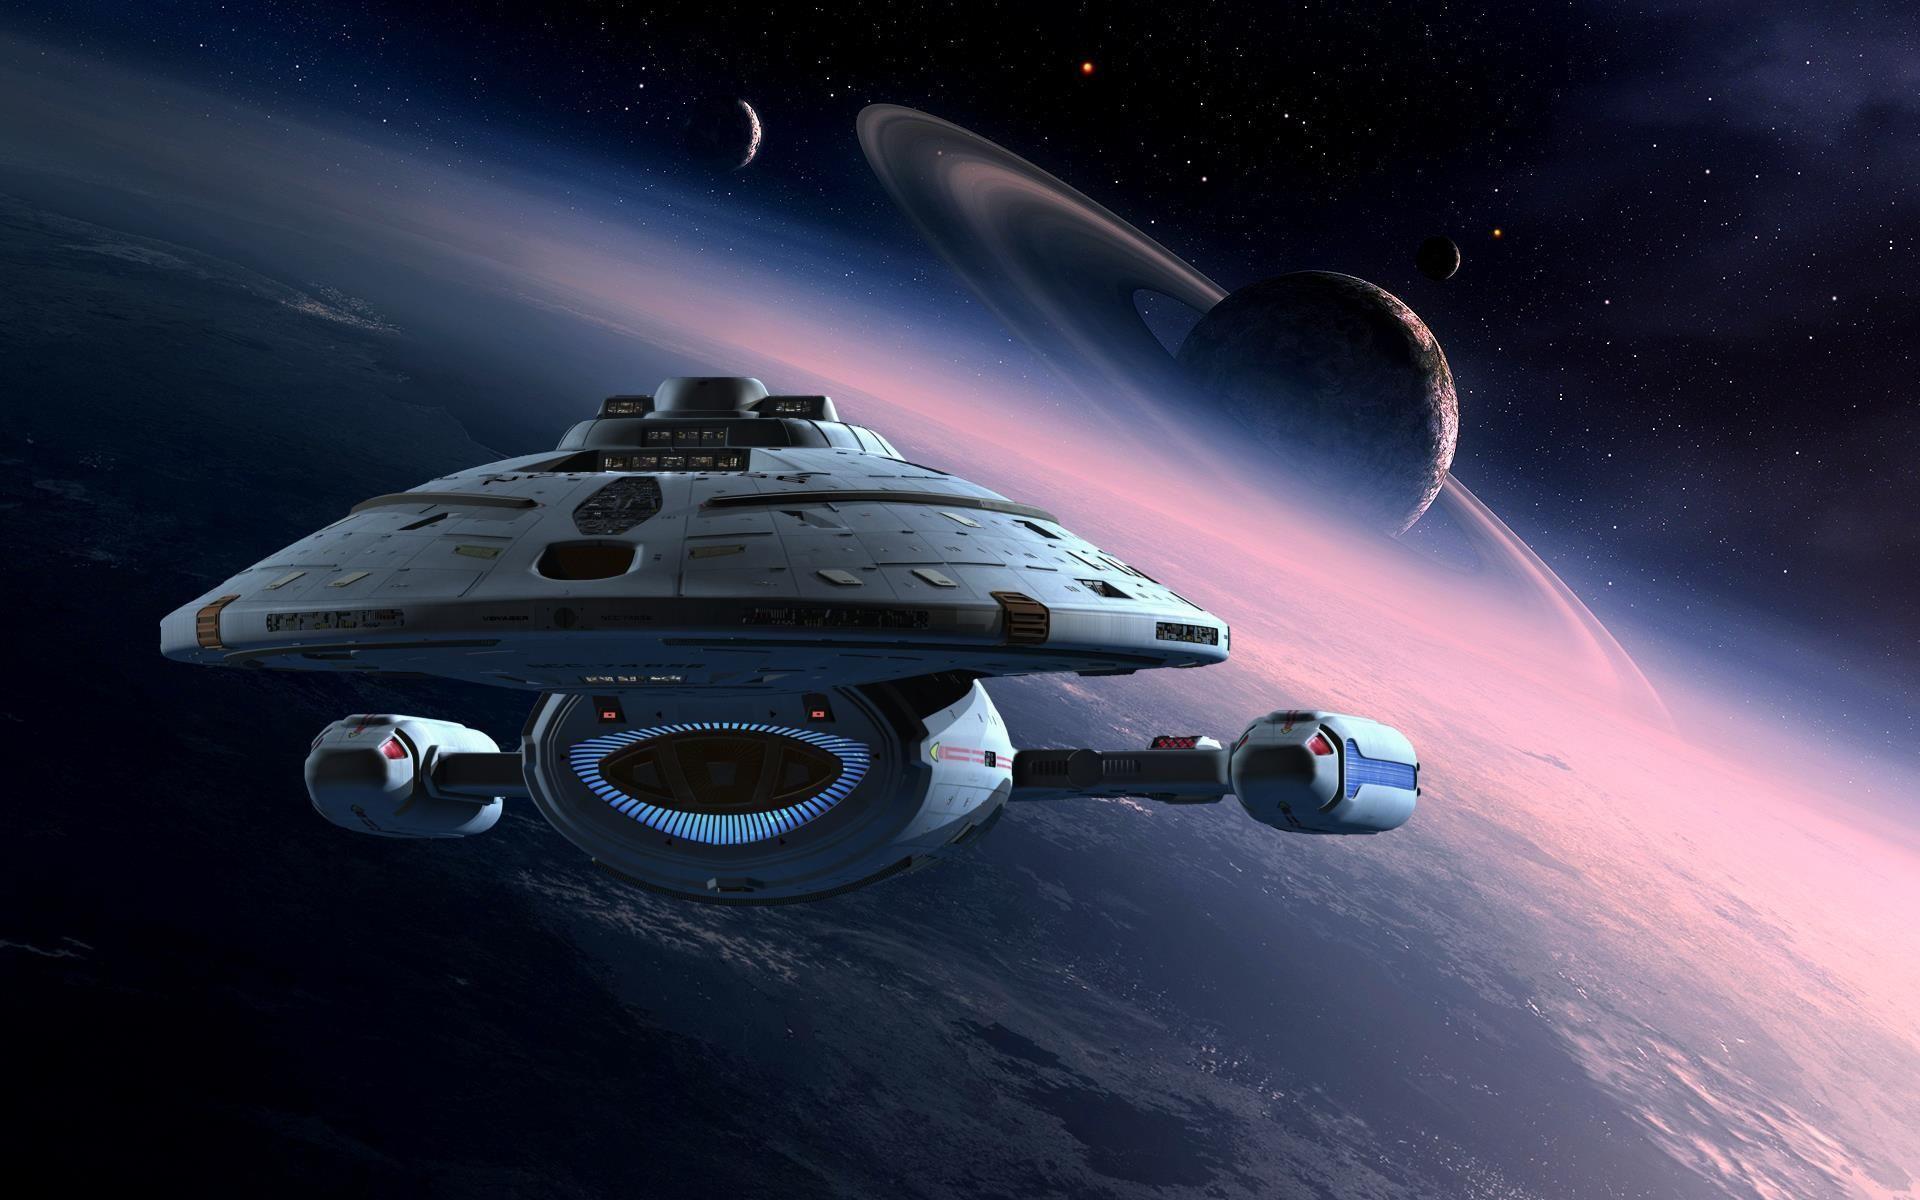 My Current Wallpaper Star Trek Voyager Star Trek Series